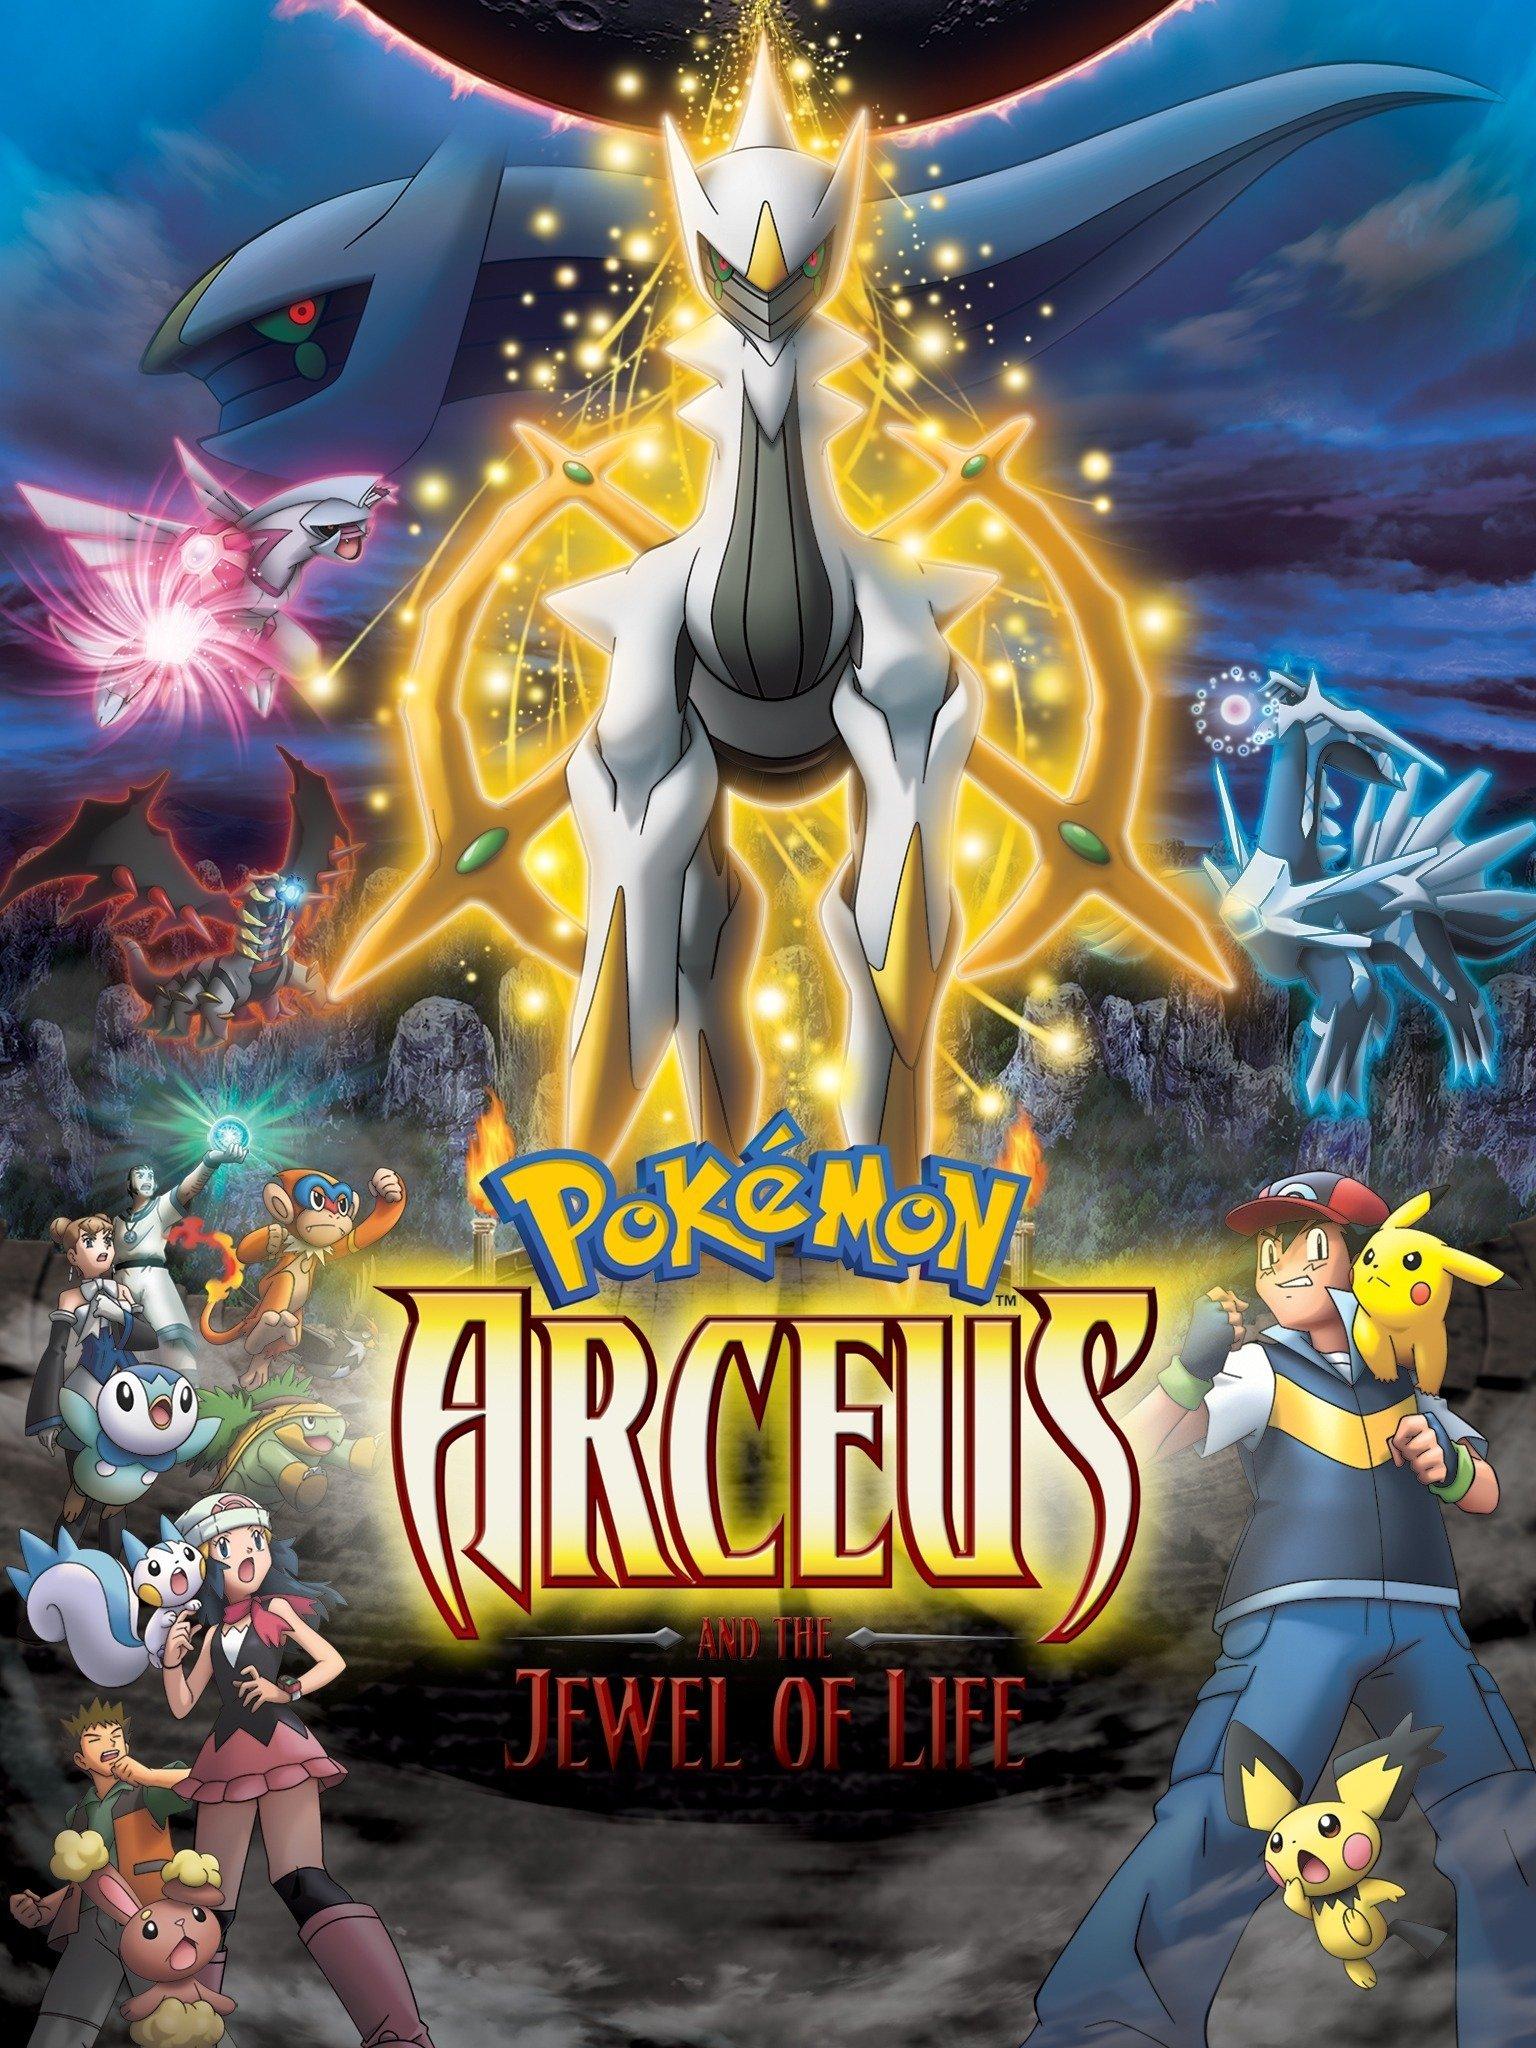 Pokémon: Arceus and the Jewel of Life (2009) - Rotten Tomatoes